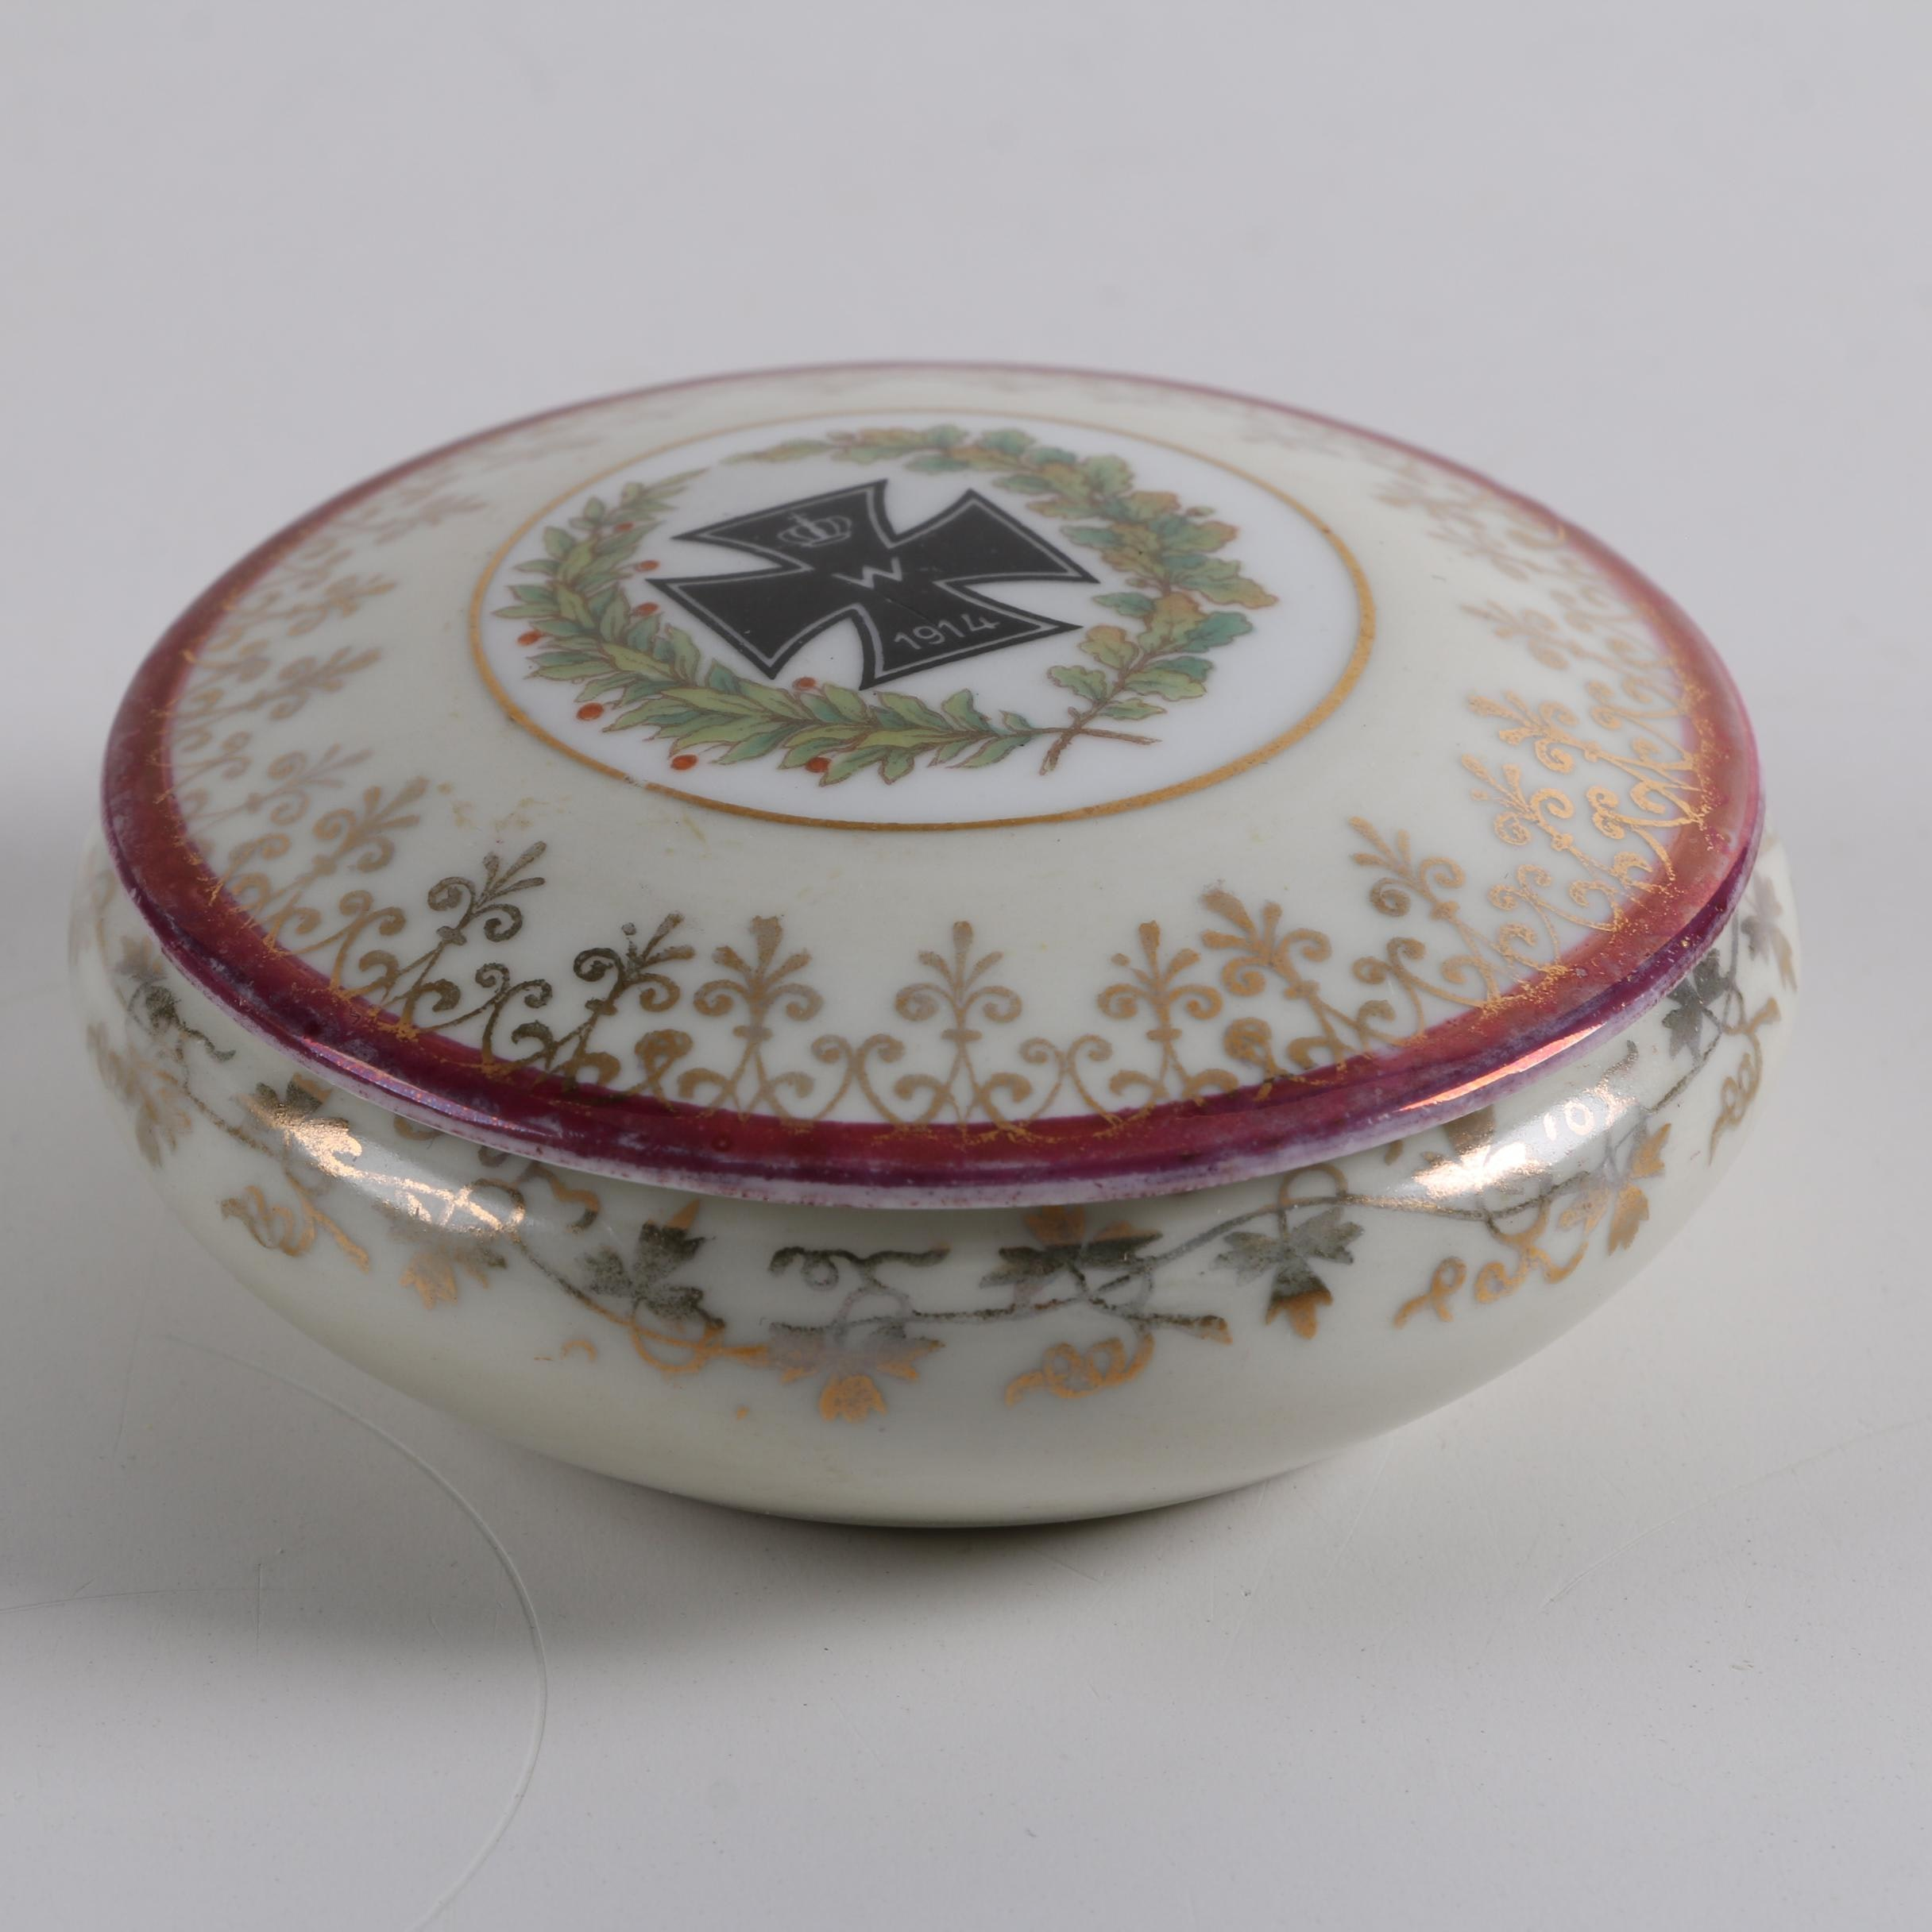 World War One 1914 Porcelain Trinket Box